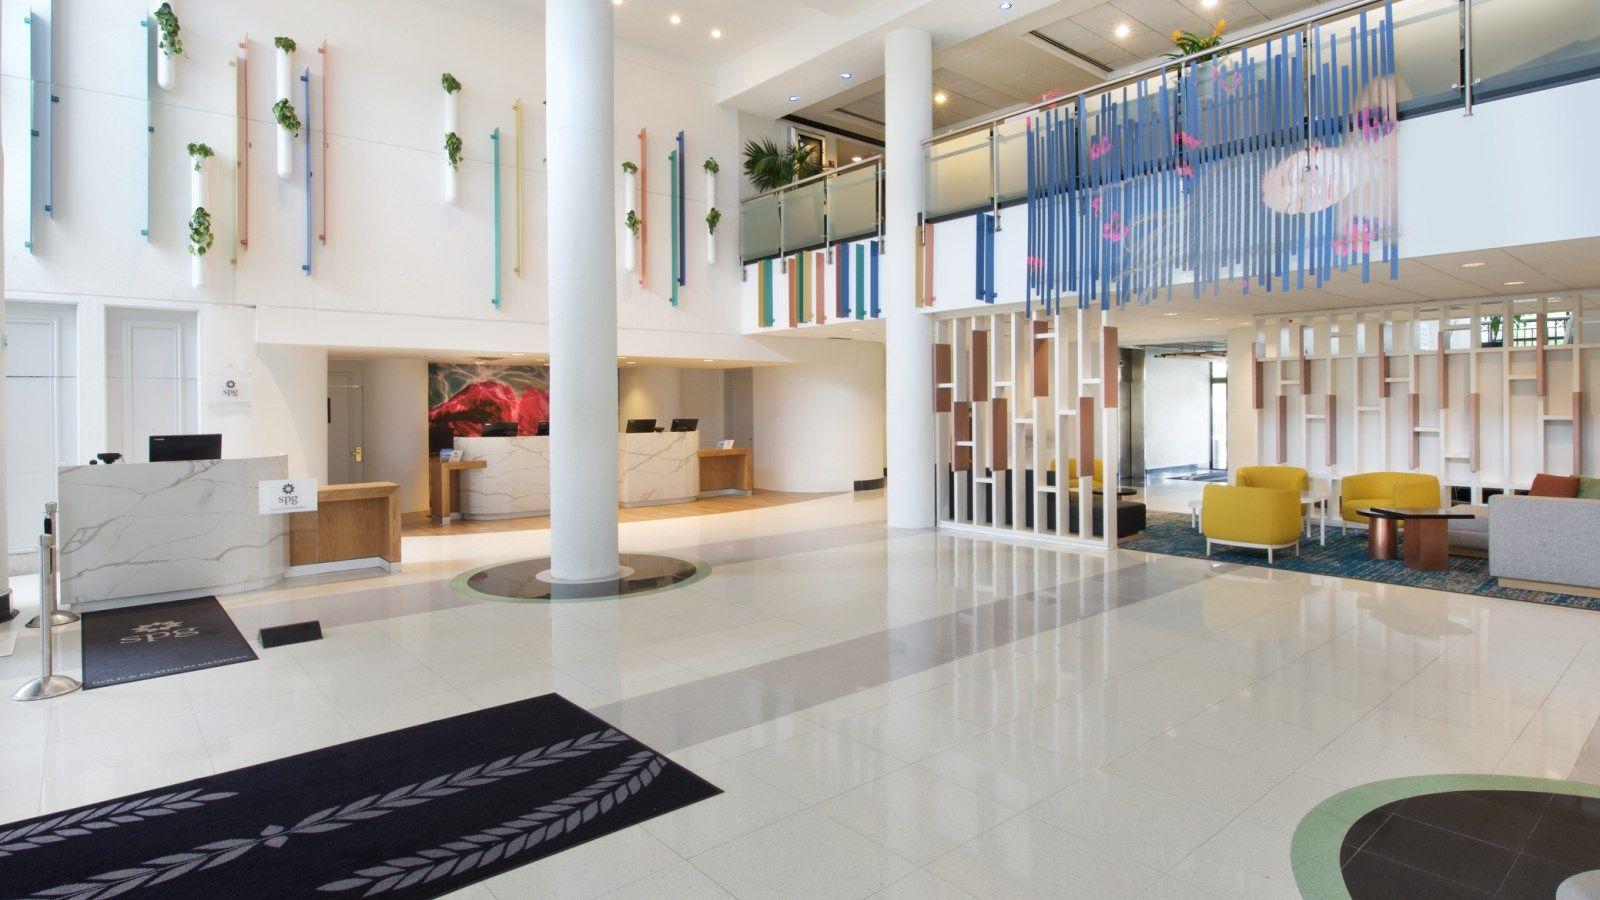 Sheraton Miami Airport Hotel & Executive Meeting Center image 2